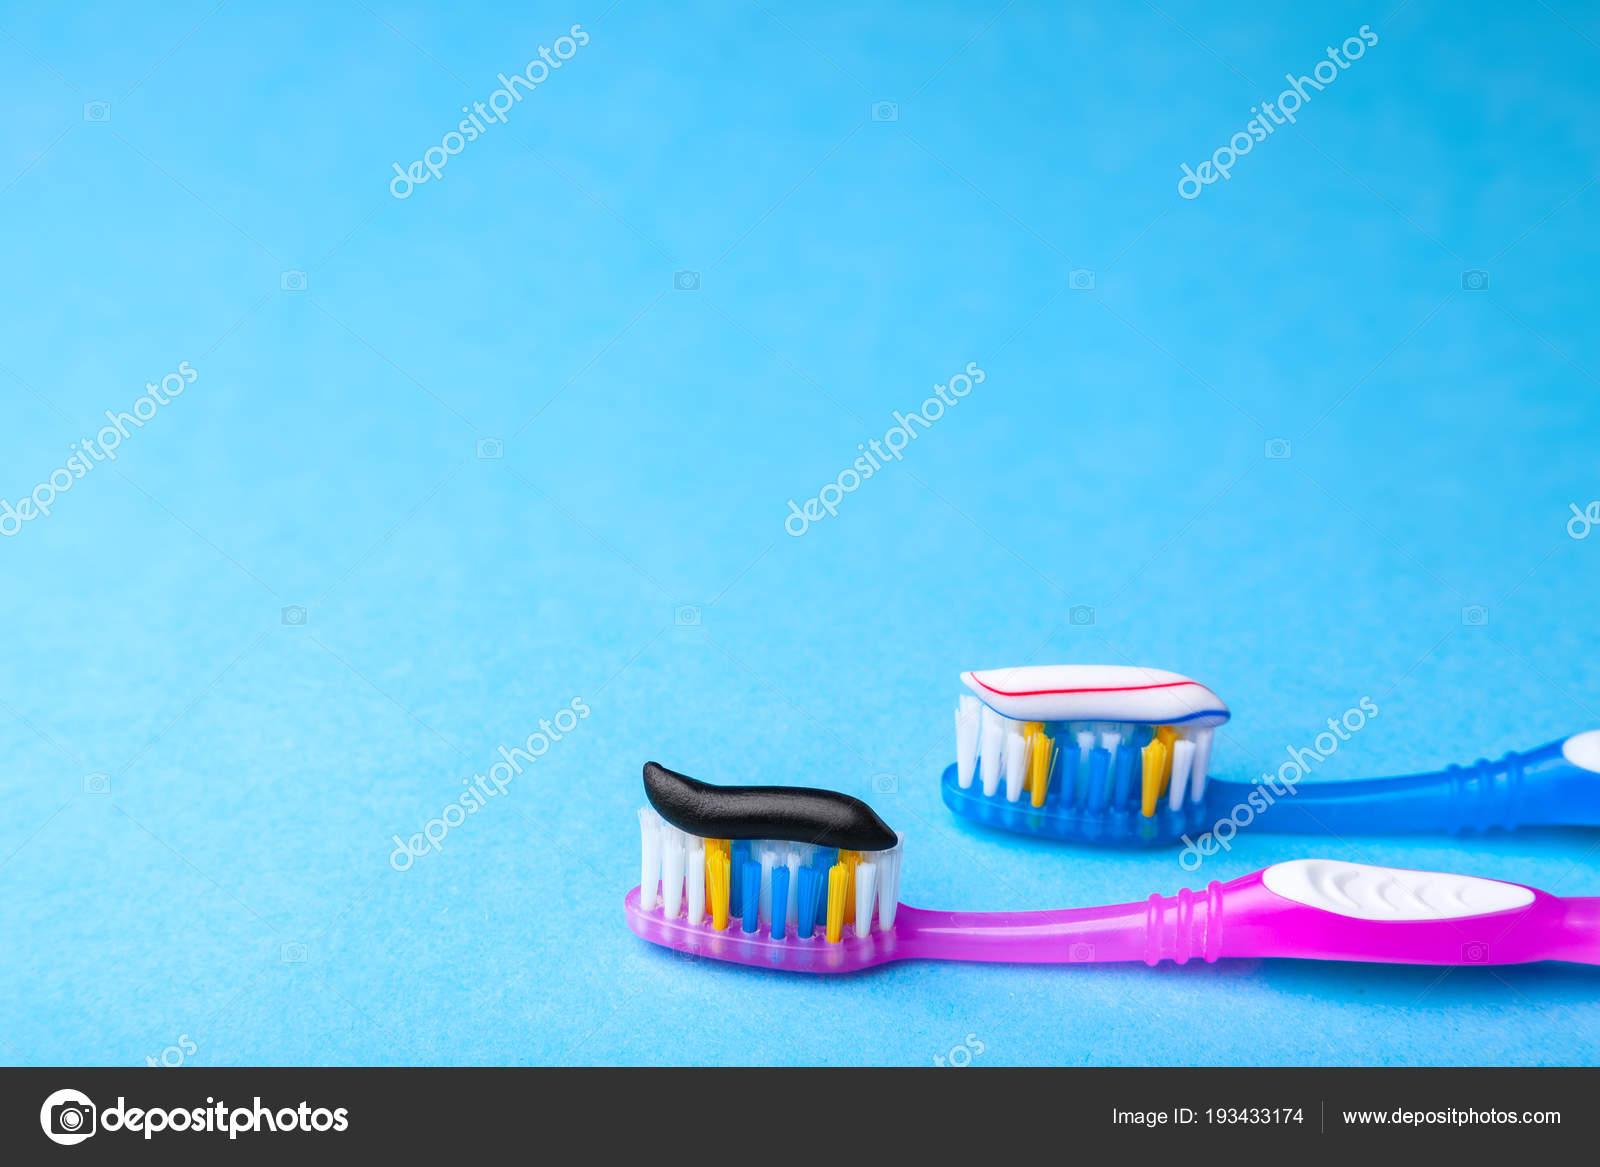 Clareamento De Dentes E Usual Colorida E Preto De Carvao Na Escova